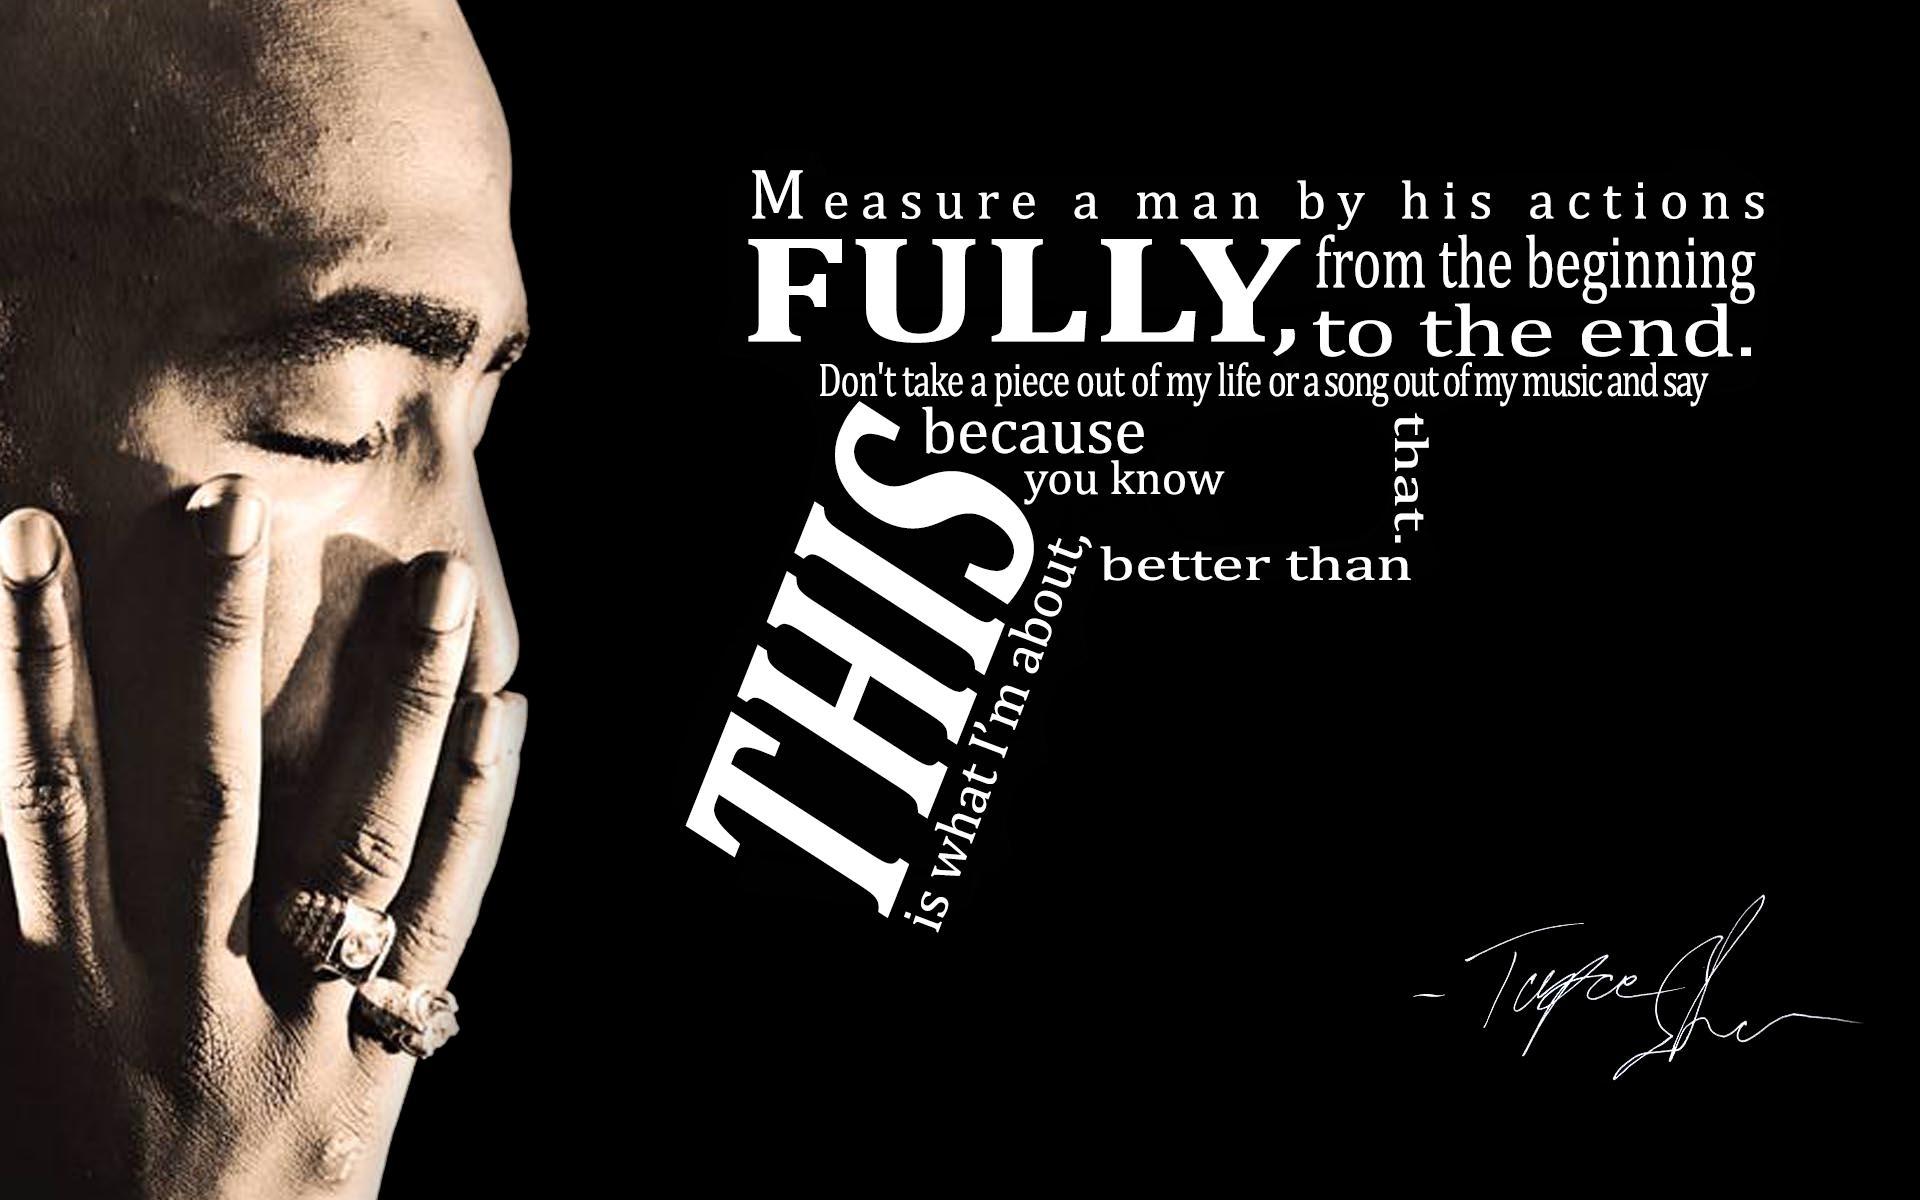 Tupac rap gangsta text quotes d wallpaper 1920x1200 45929 1920x1200